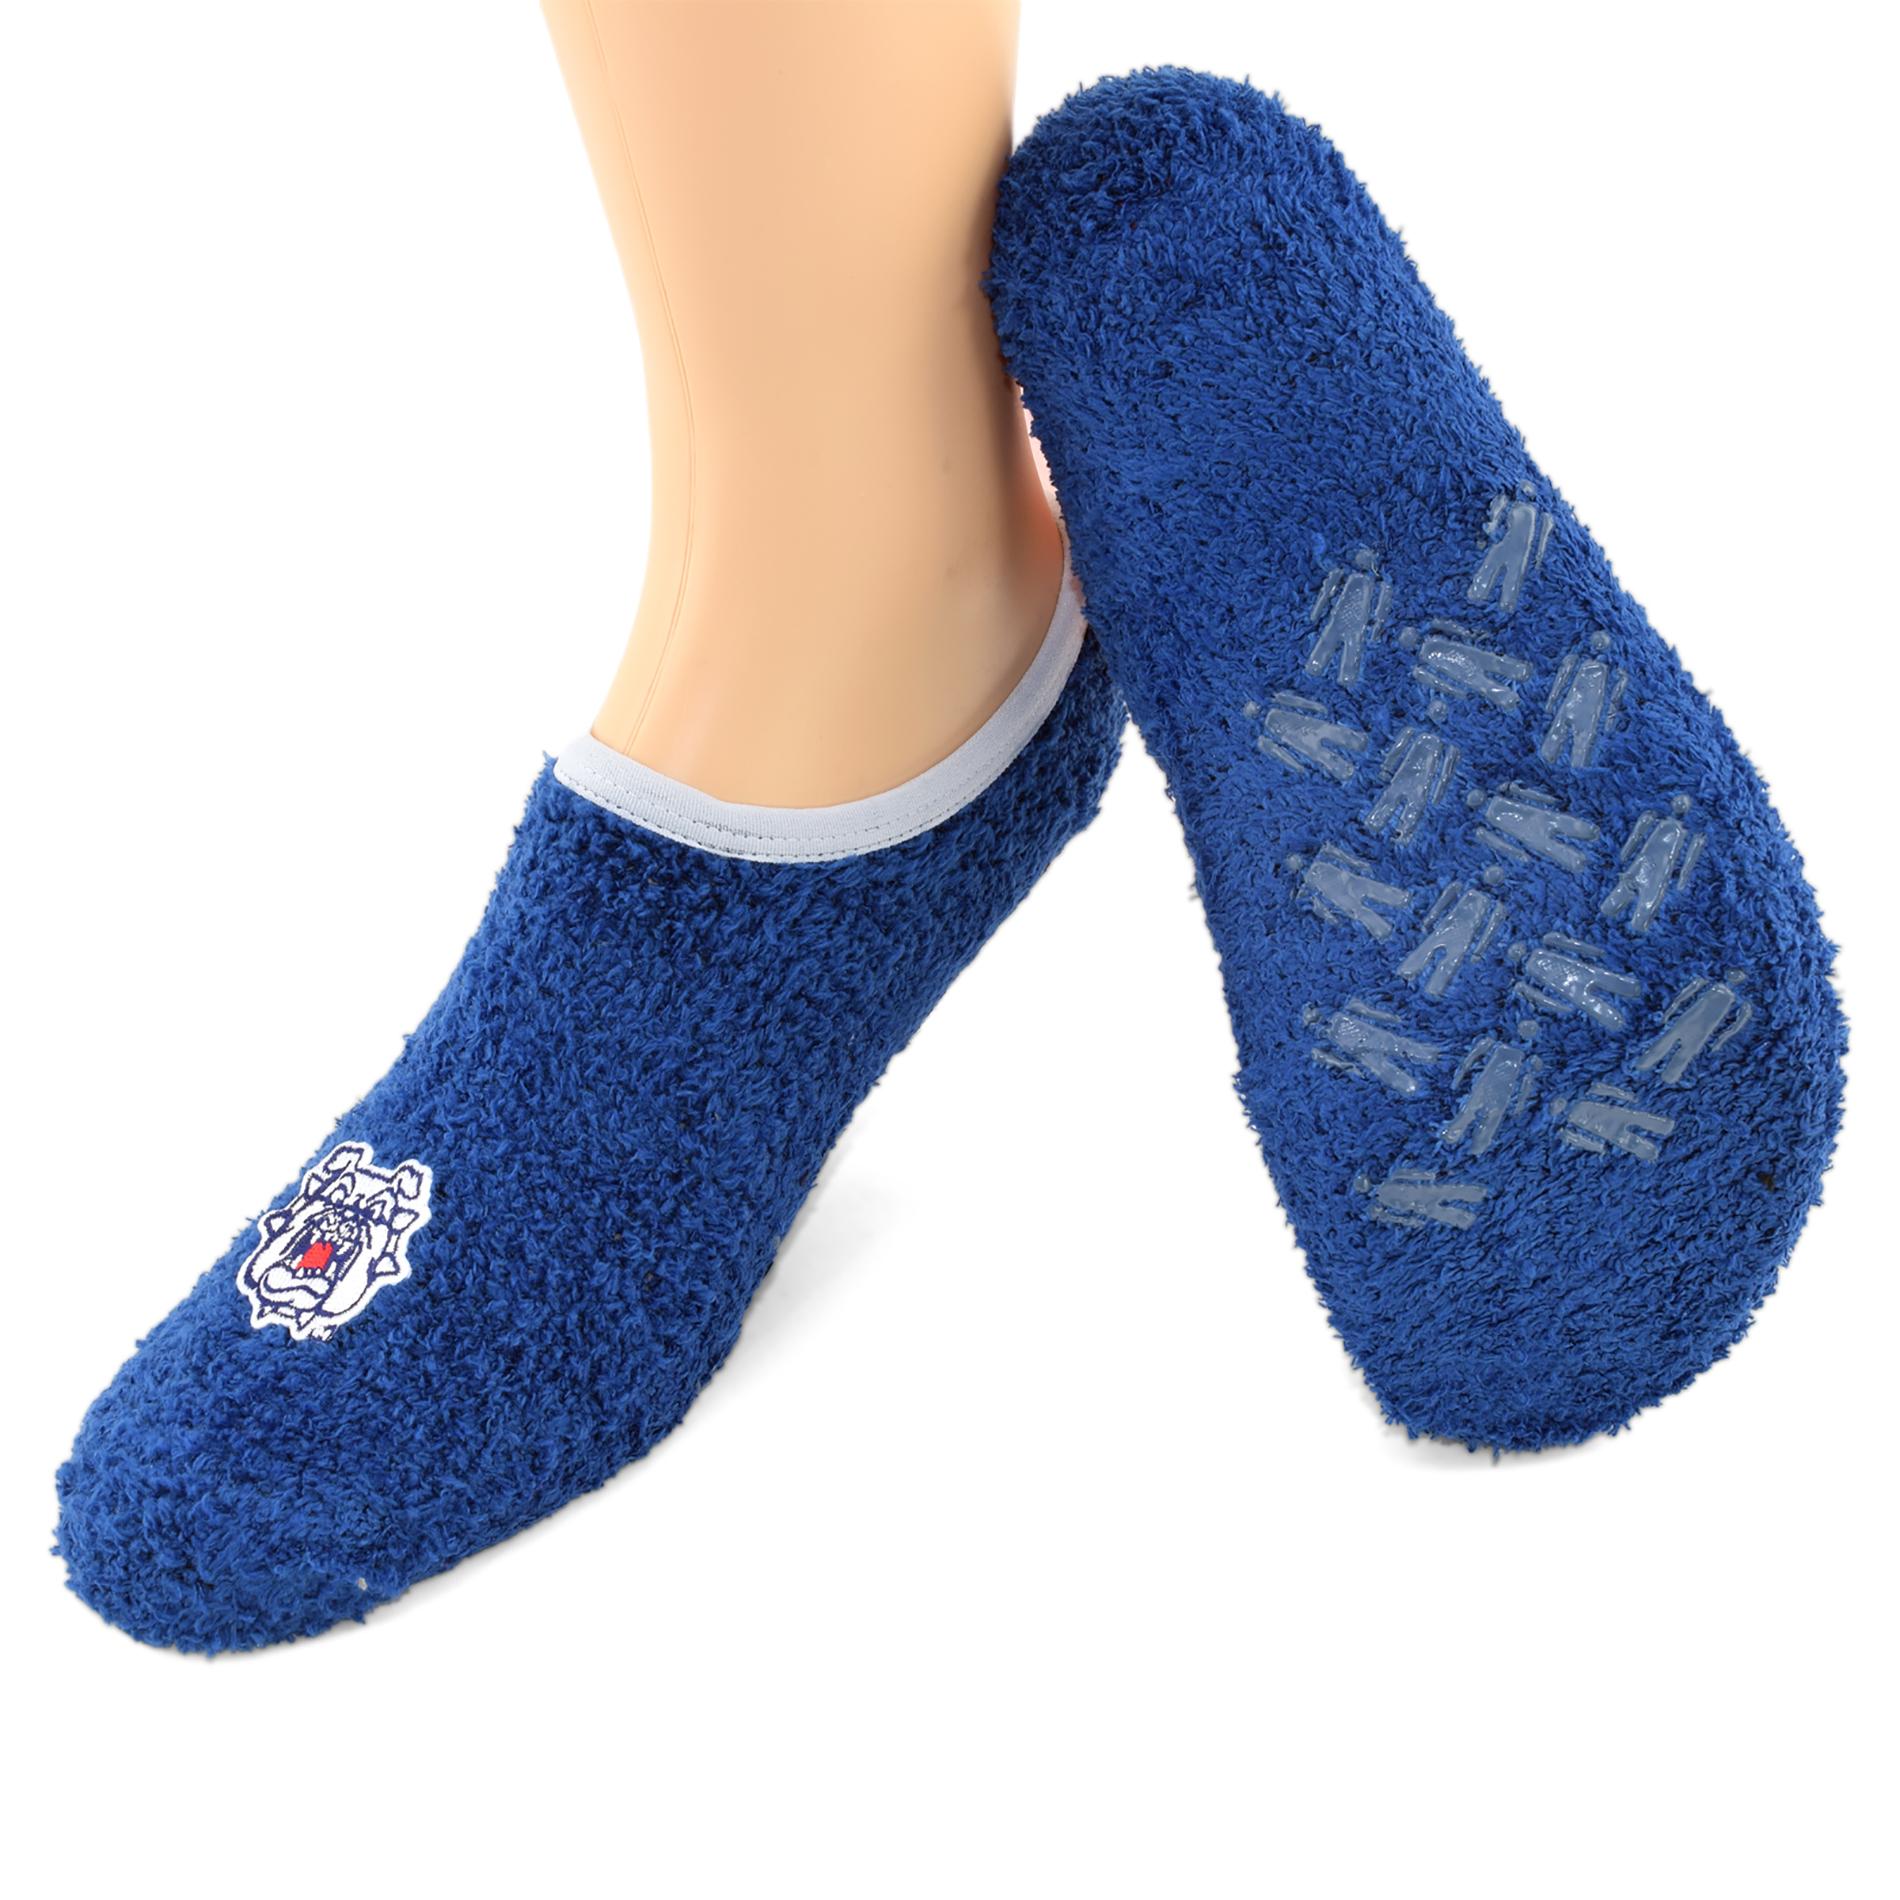 NCAA Women's Fresno State Bulldogs Low-Cut Socks, Size: One size